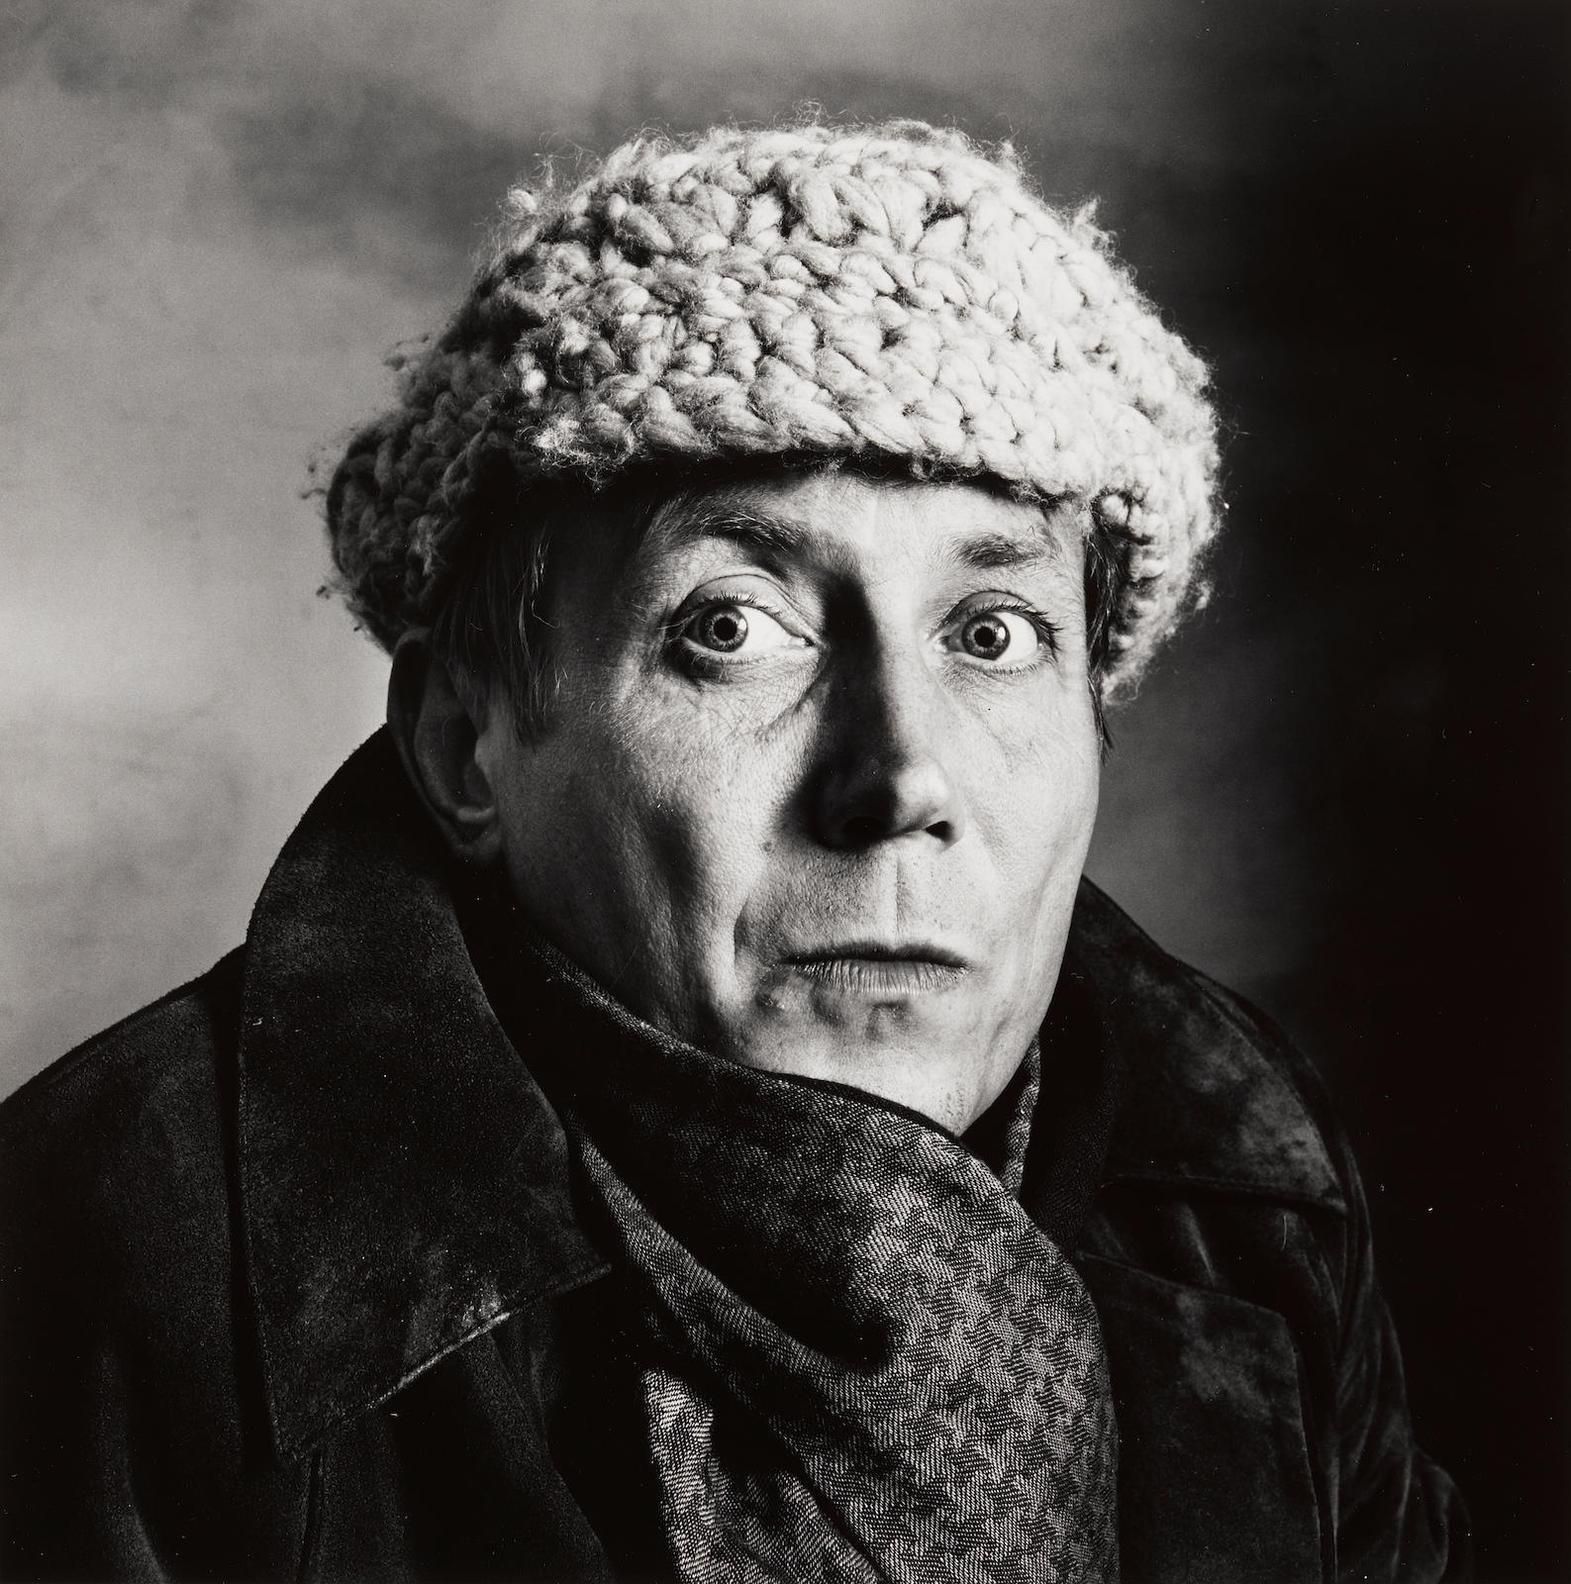 Irving Penn-Yevgeni Yevtushenko, New York, March 1972-1972